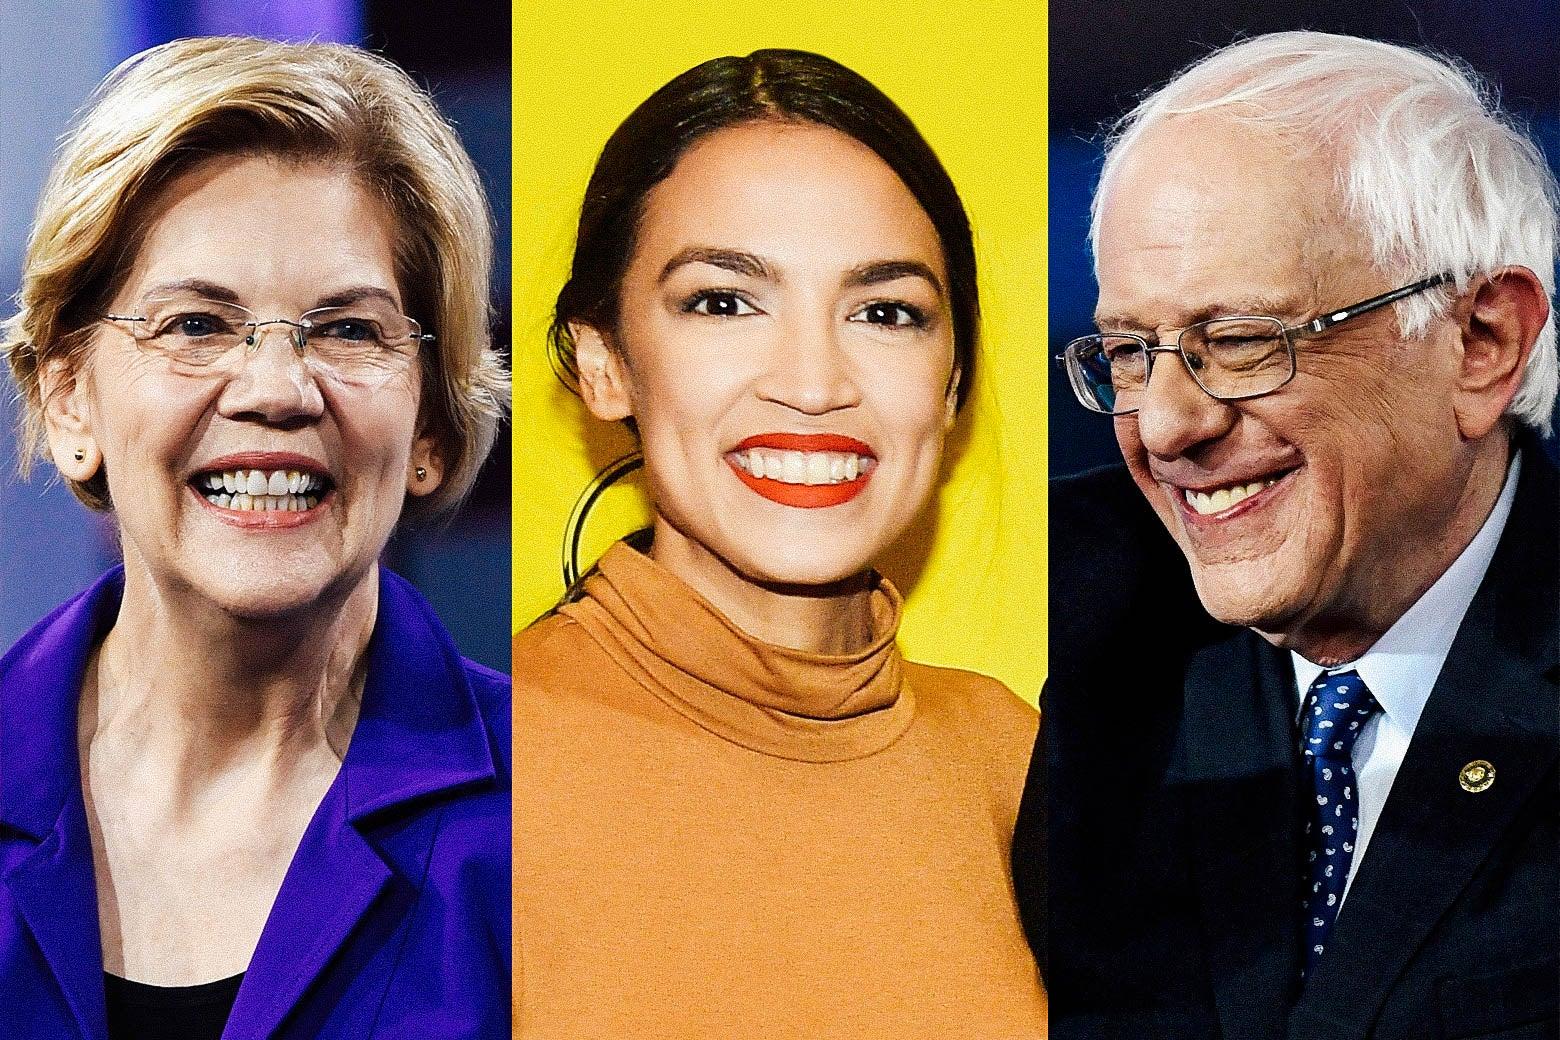 Photo illustration of Elizabeth Warren, Alexandria Ocasio-Cortez, and Bernie Sanders